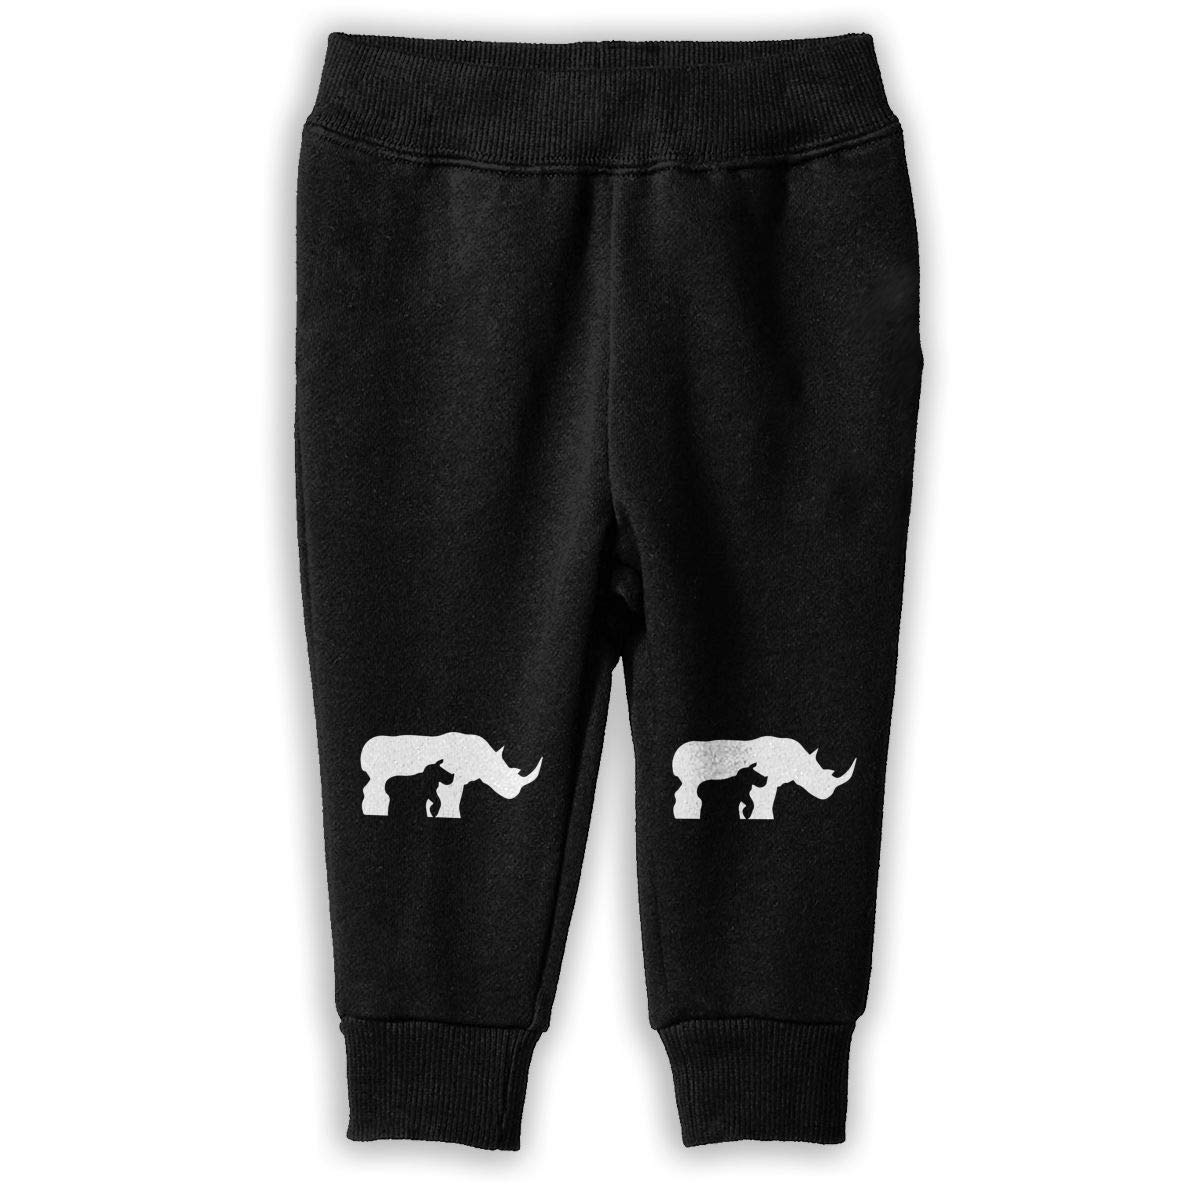 Kids Training Pants NJKM5MJ Black and White Rhino-1 Sweatpants